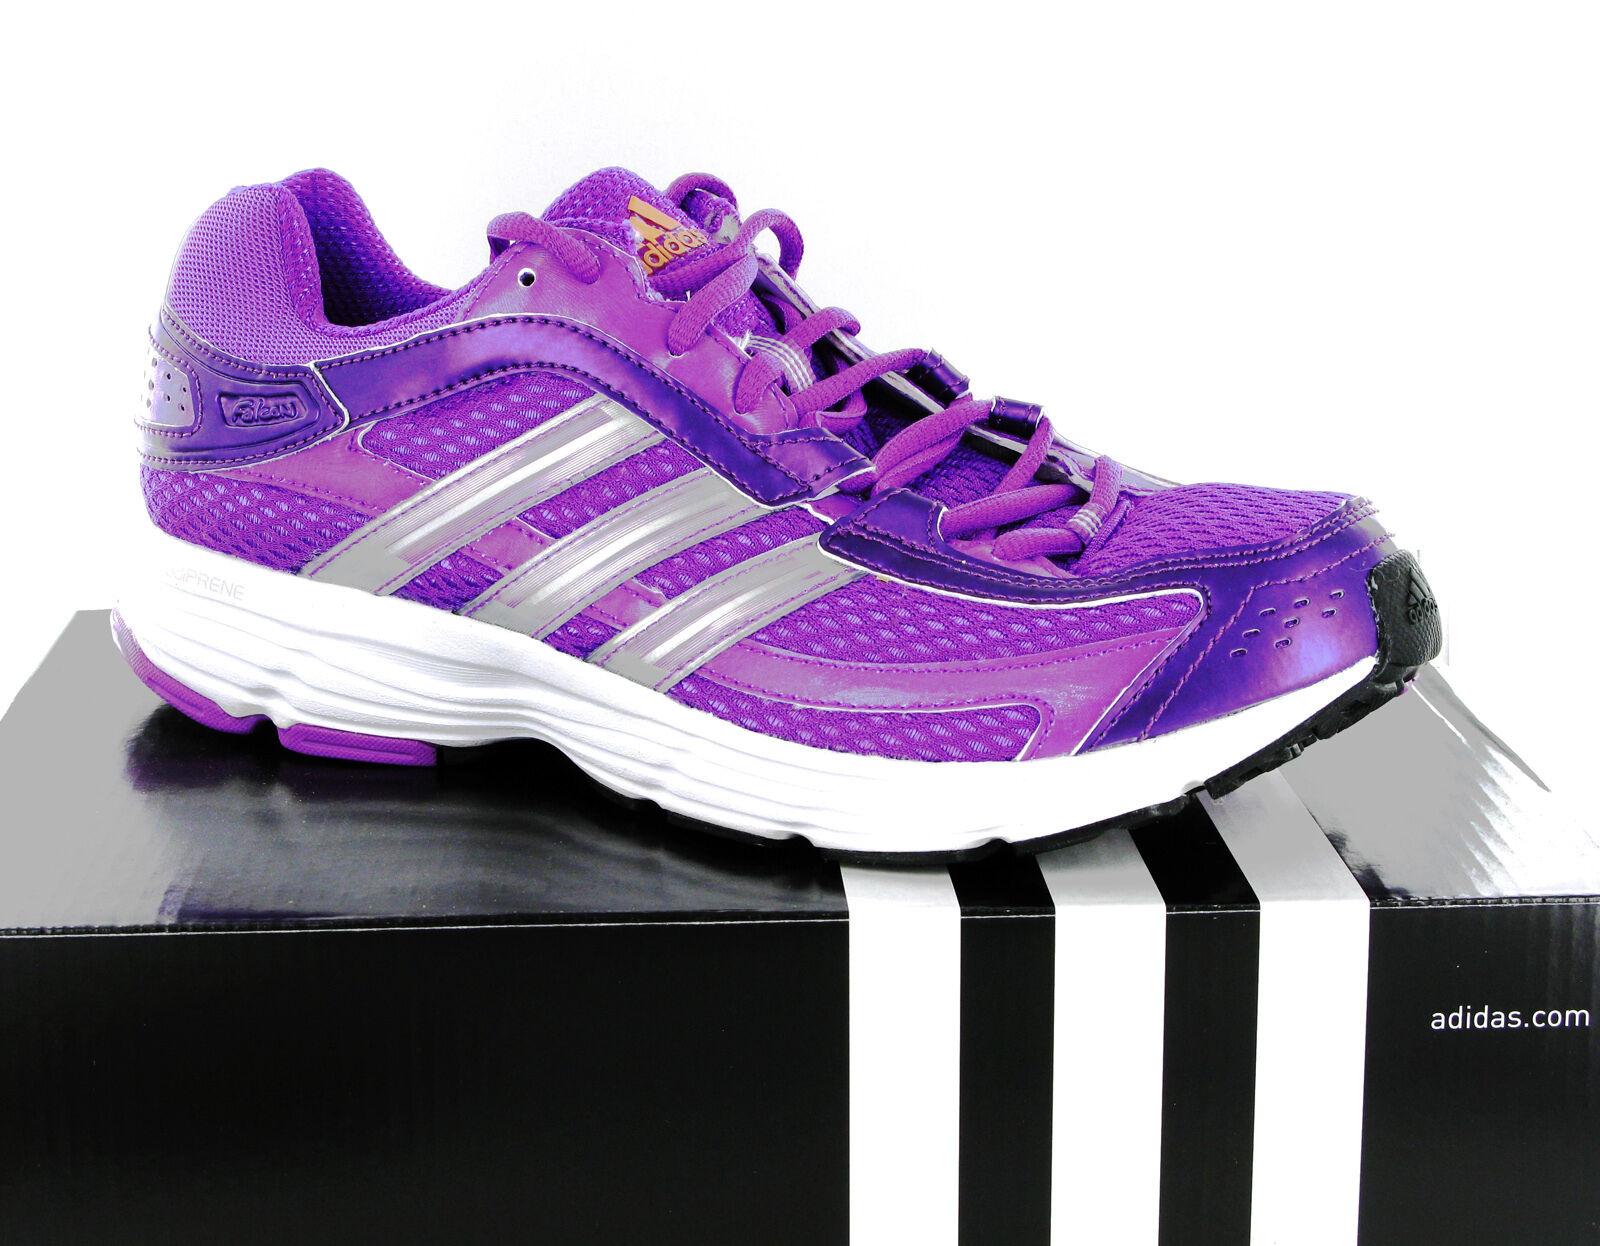 Adidas Falcon Elite Running Training